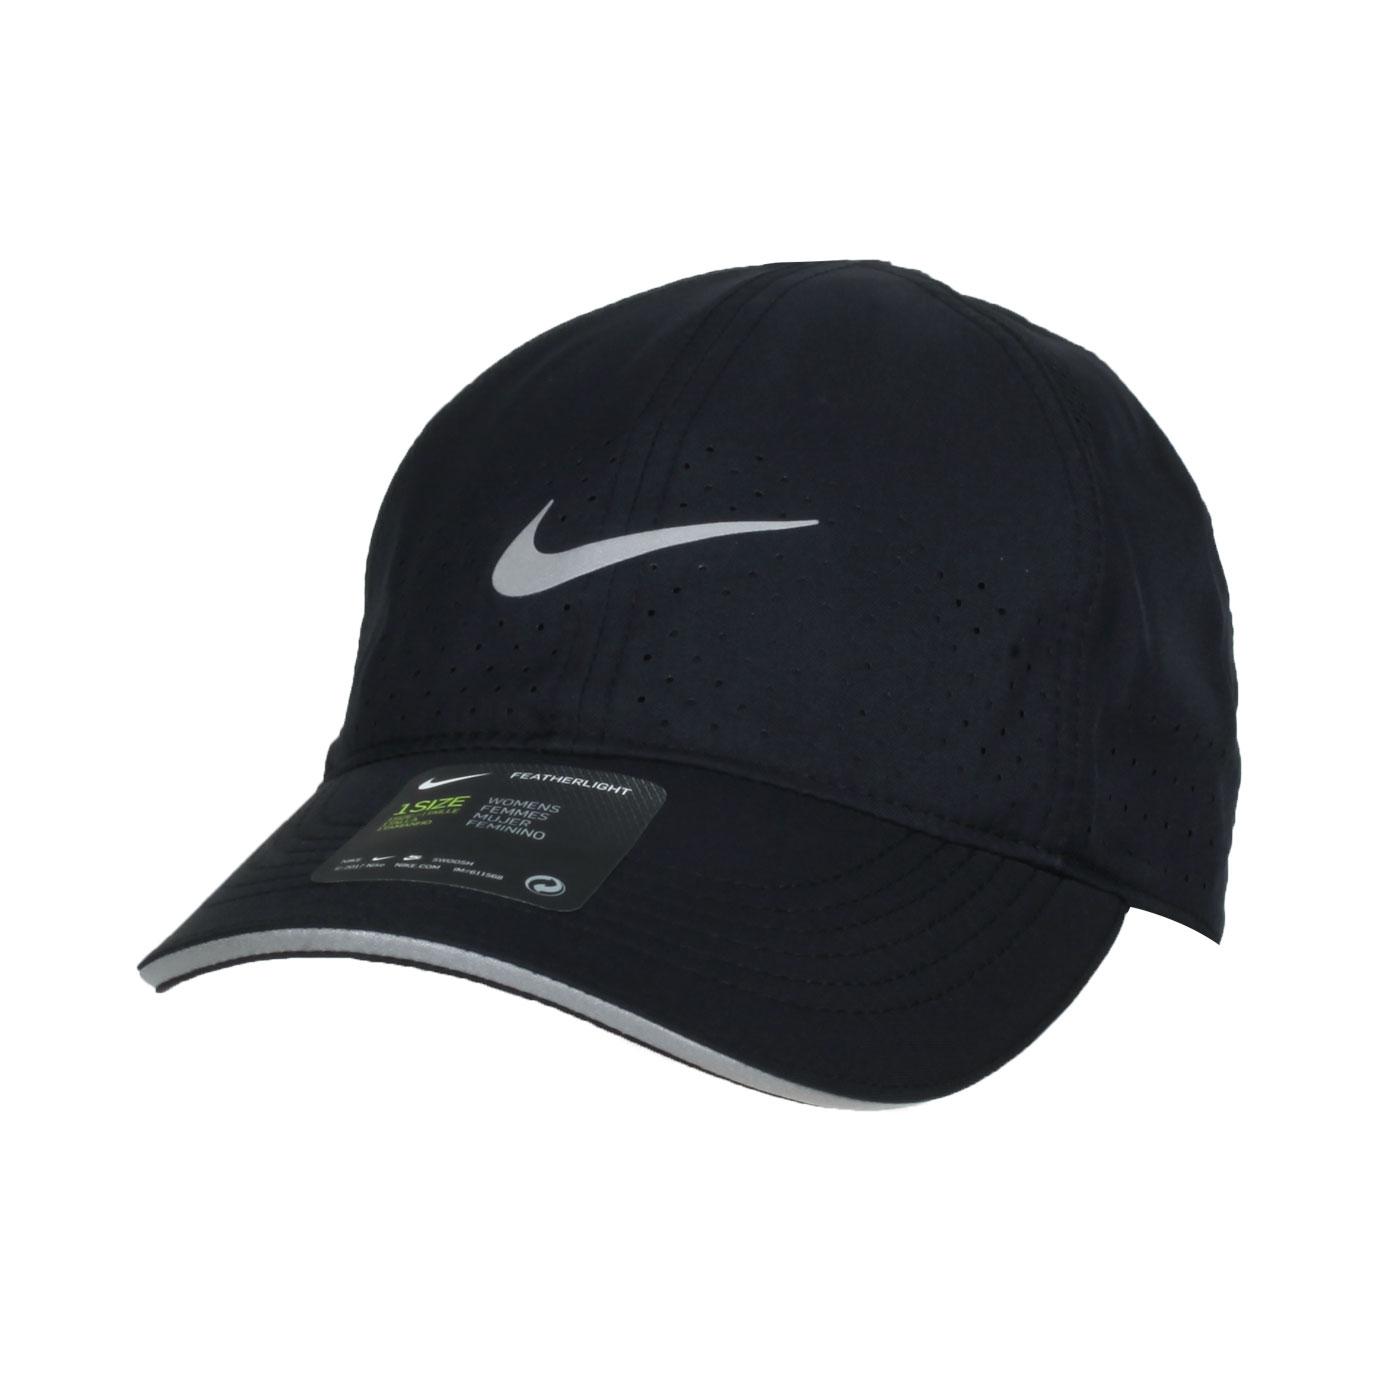 NIKE 運動帽 DC4090-010 - 黑銀